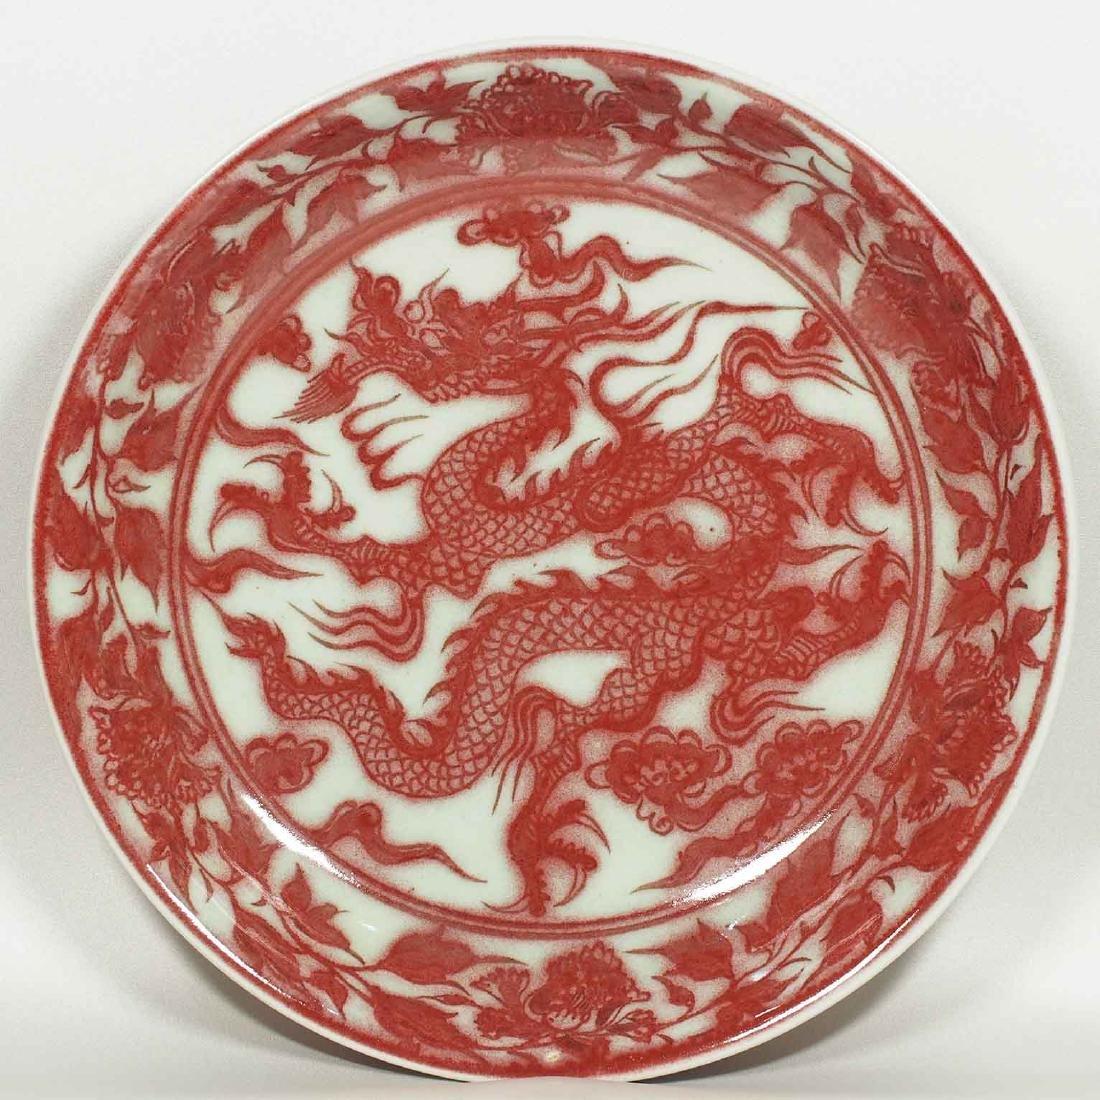 Plate with Dragon Design, Zhizheng Mark, Yuan Dynasty